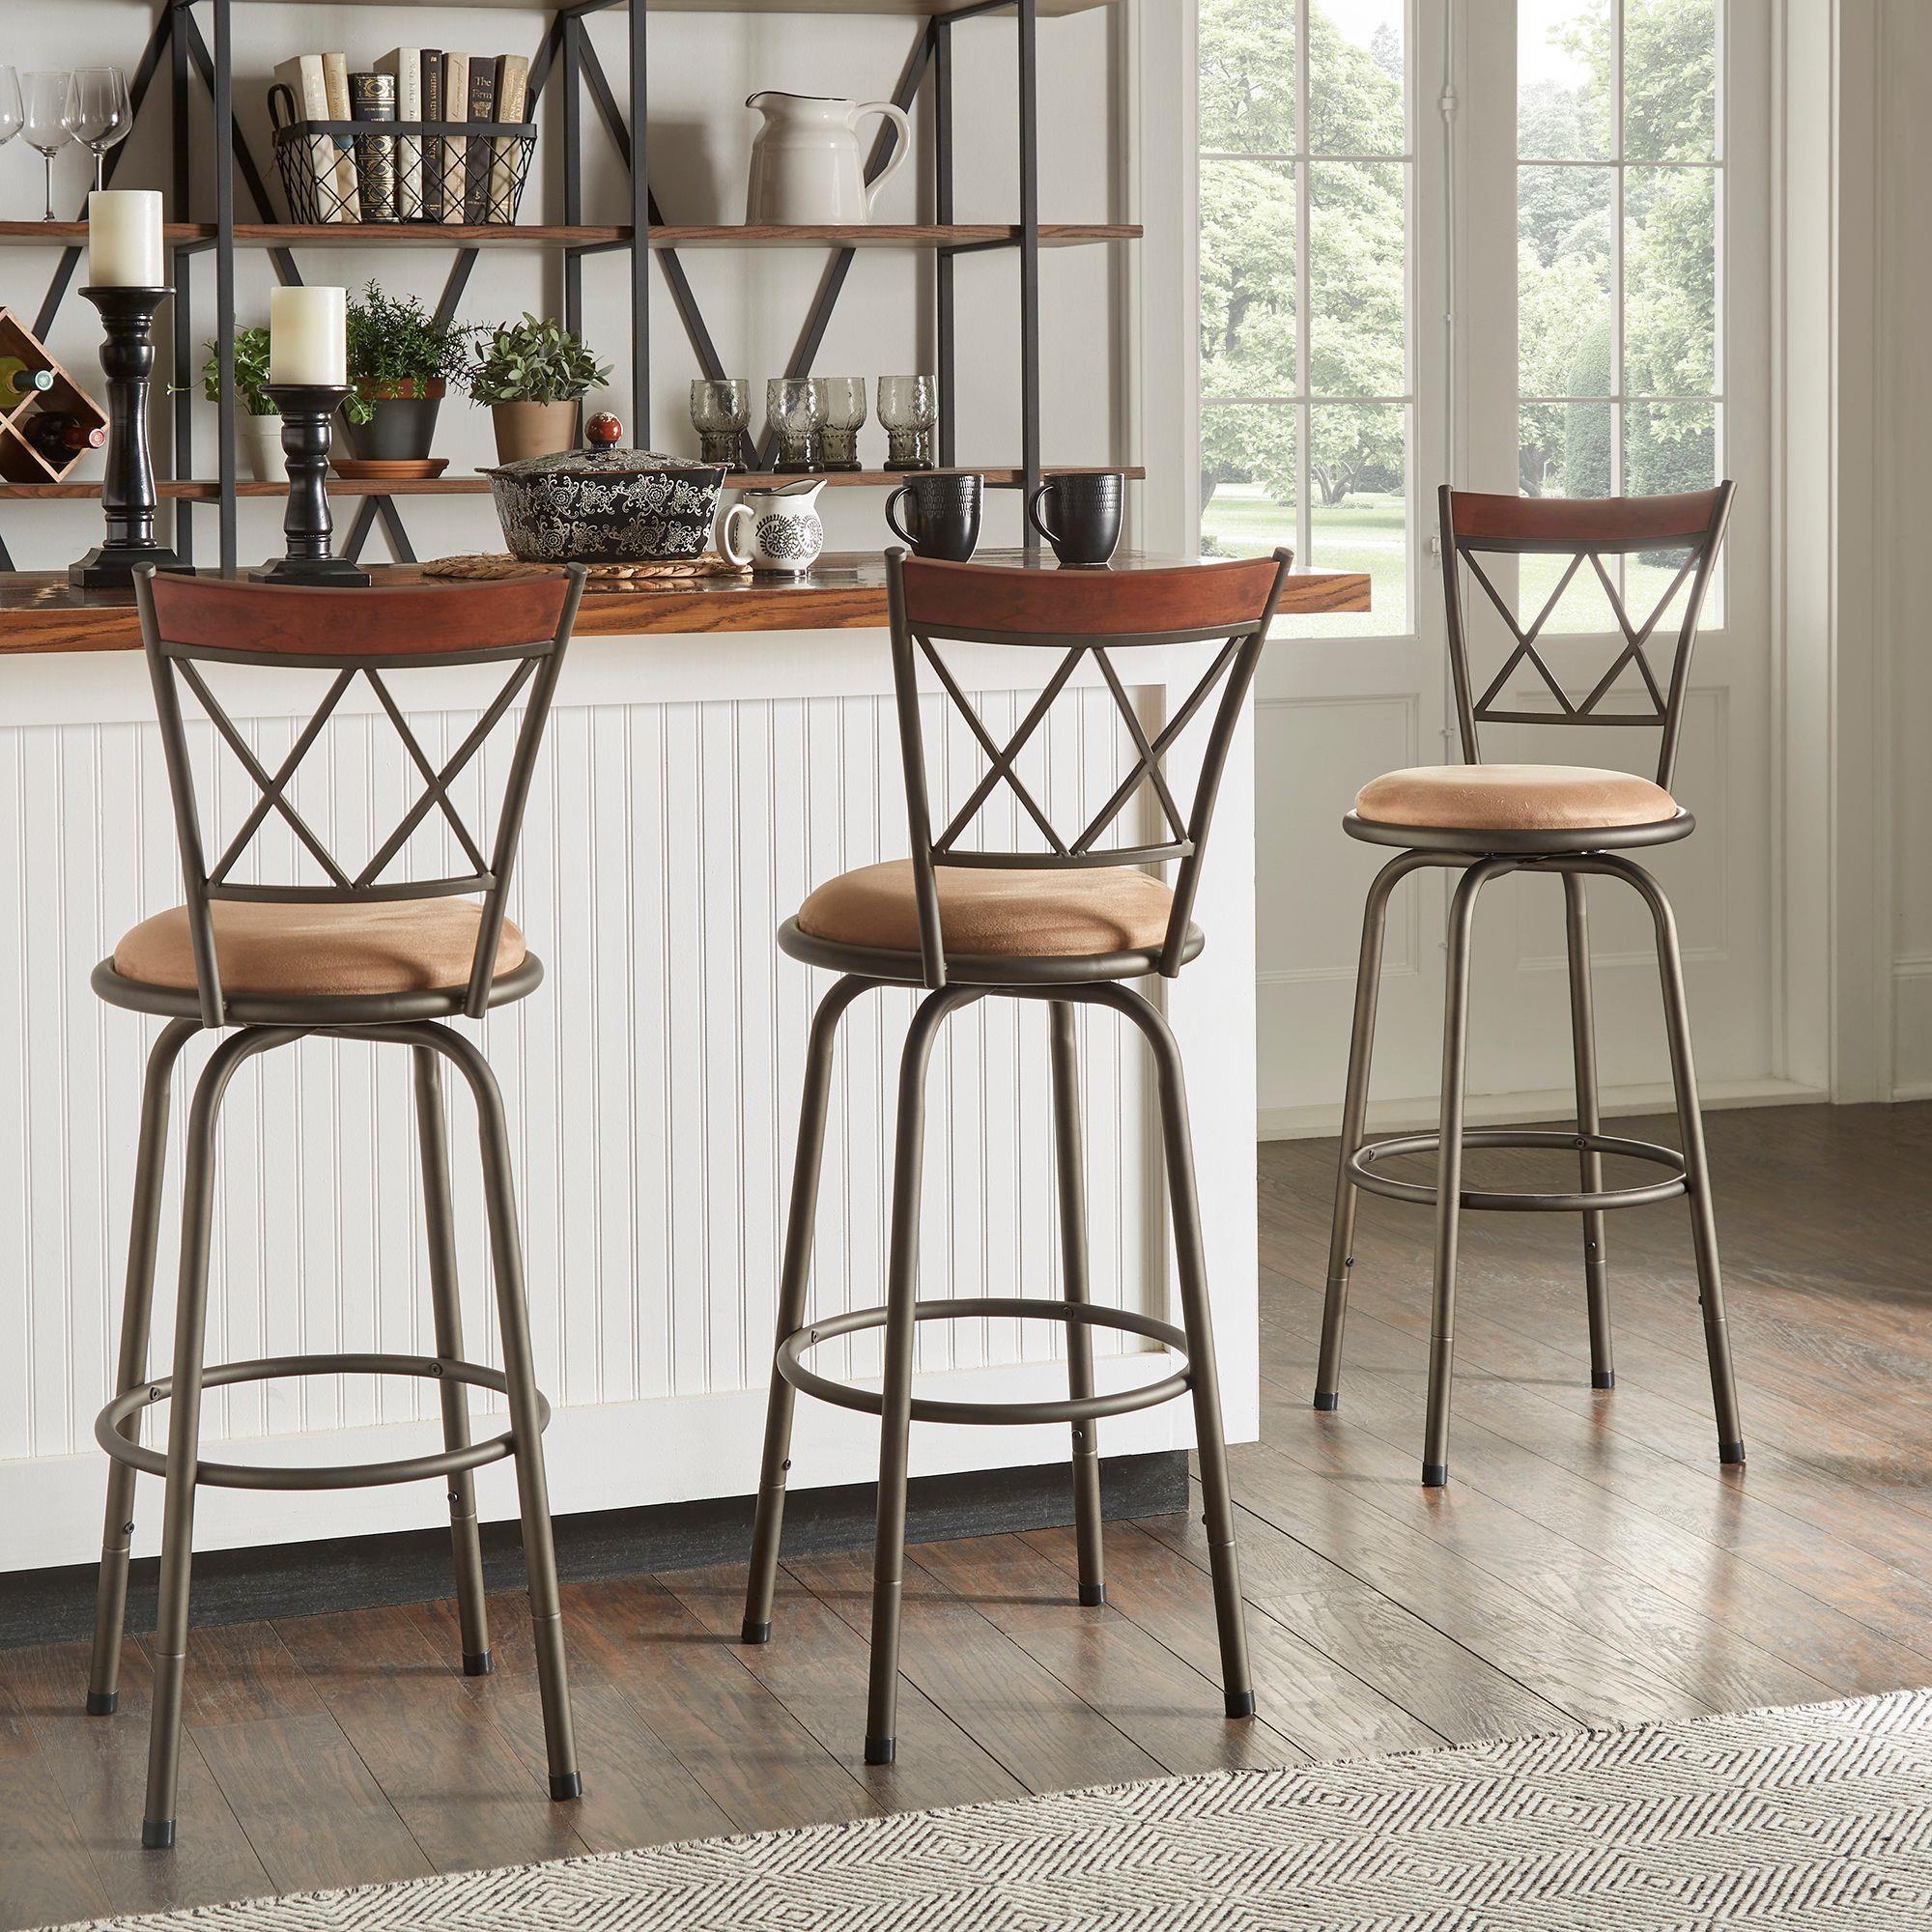 855 Set of 3 Adjustable Height Stools by Homelegance at Darvin Furniture